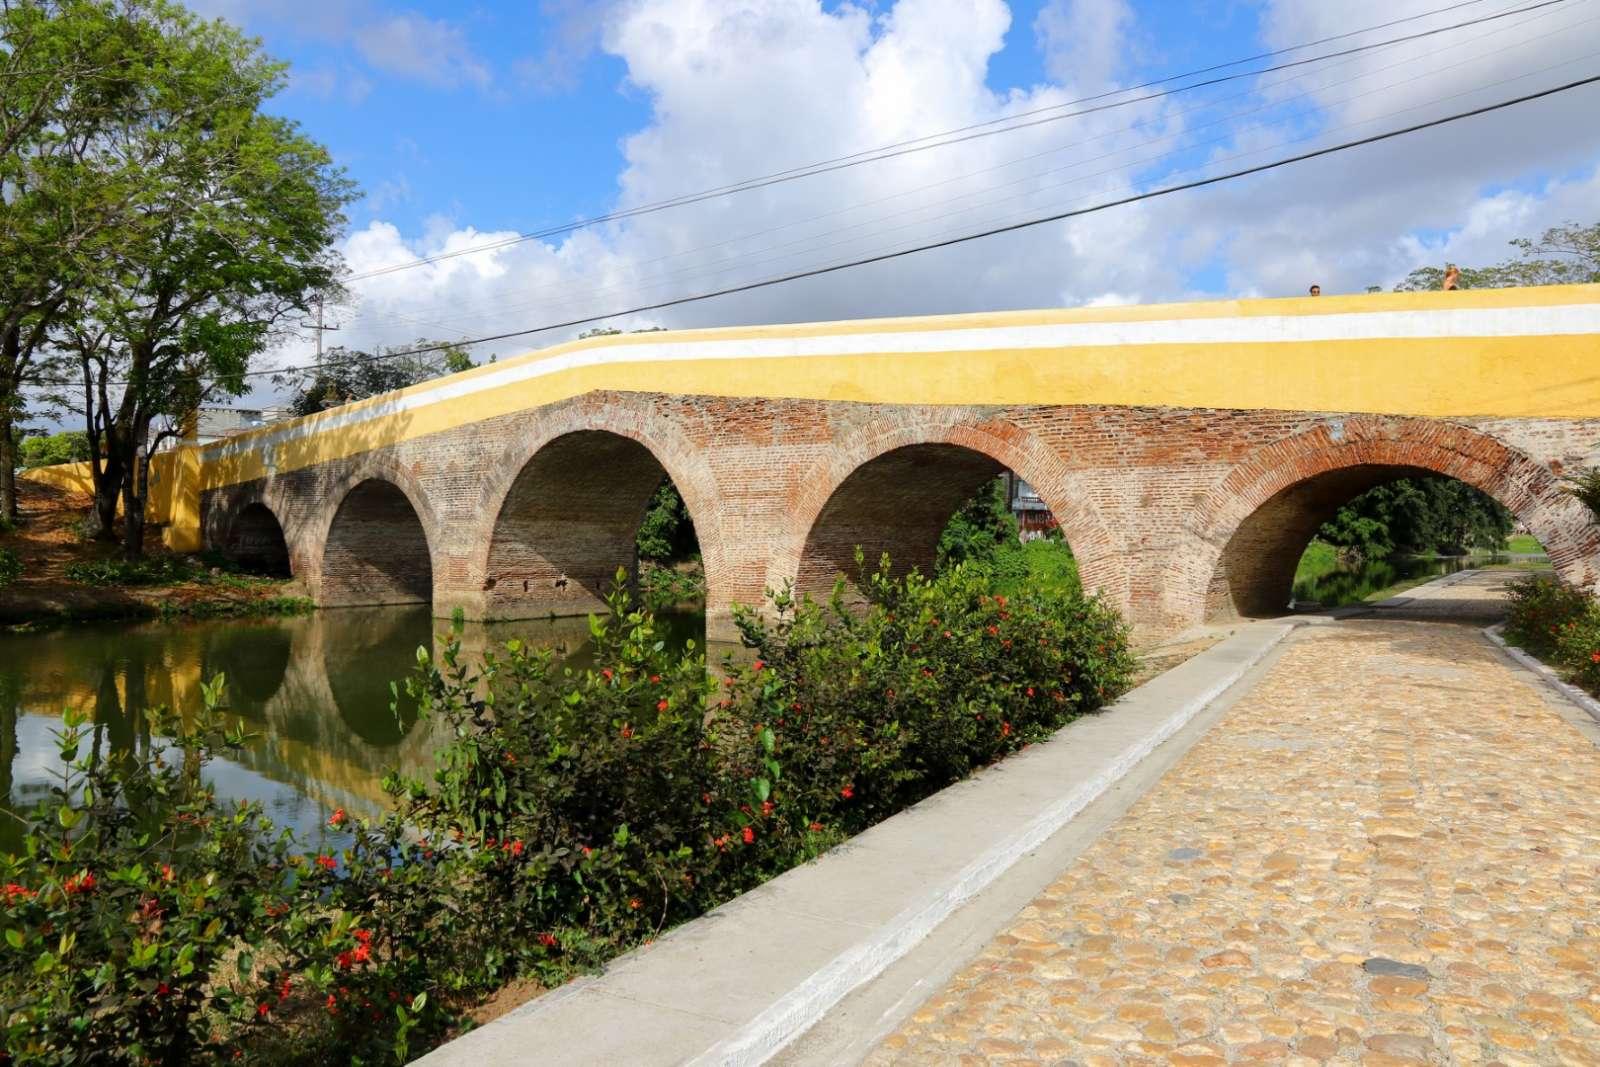 Iconic Puente Yayabo in Sancti Spiritus